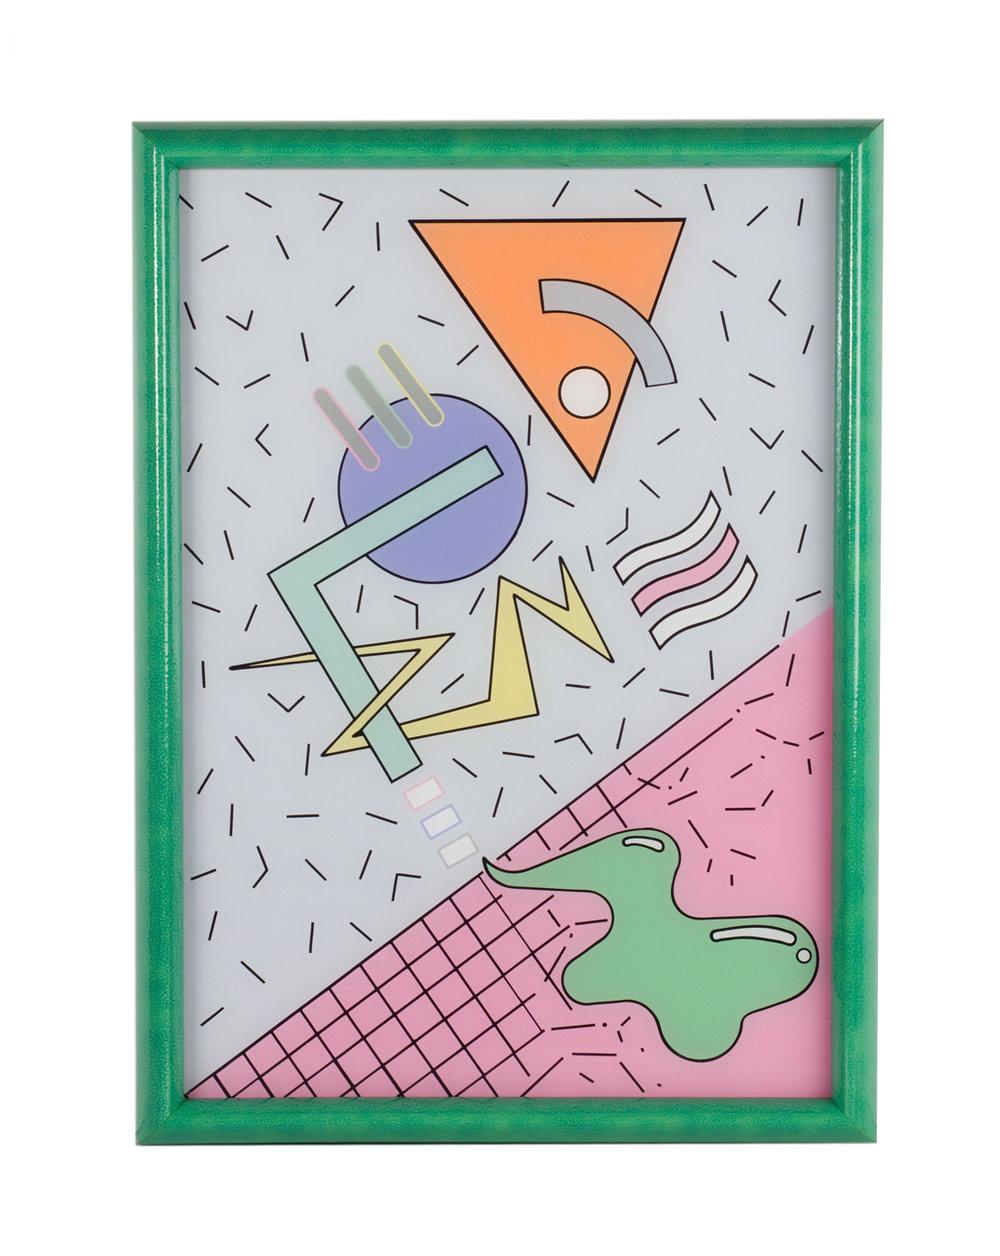 Smoker Joker, Reverse acrylic paint on plexiglass. 2015.jpeg